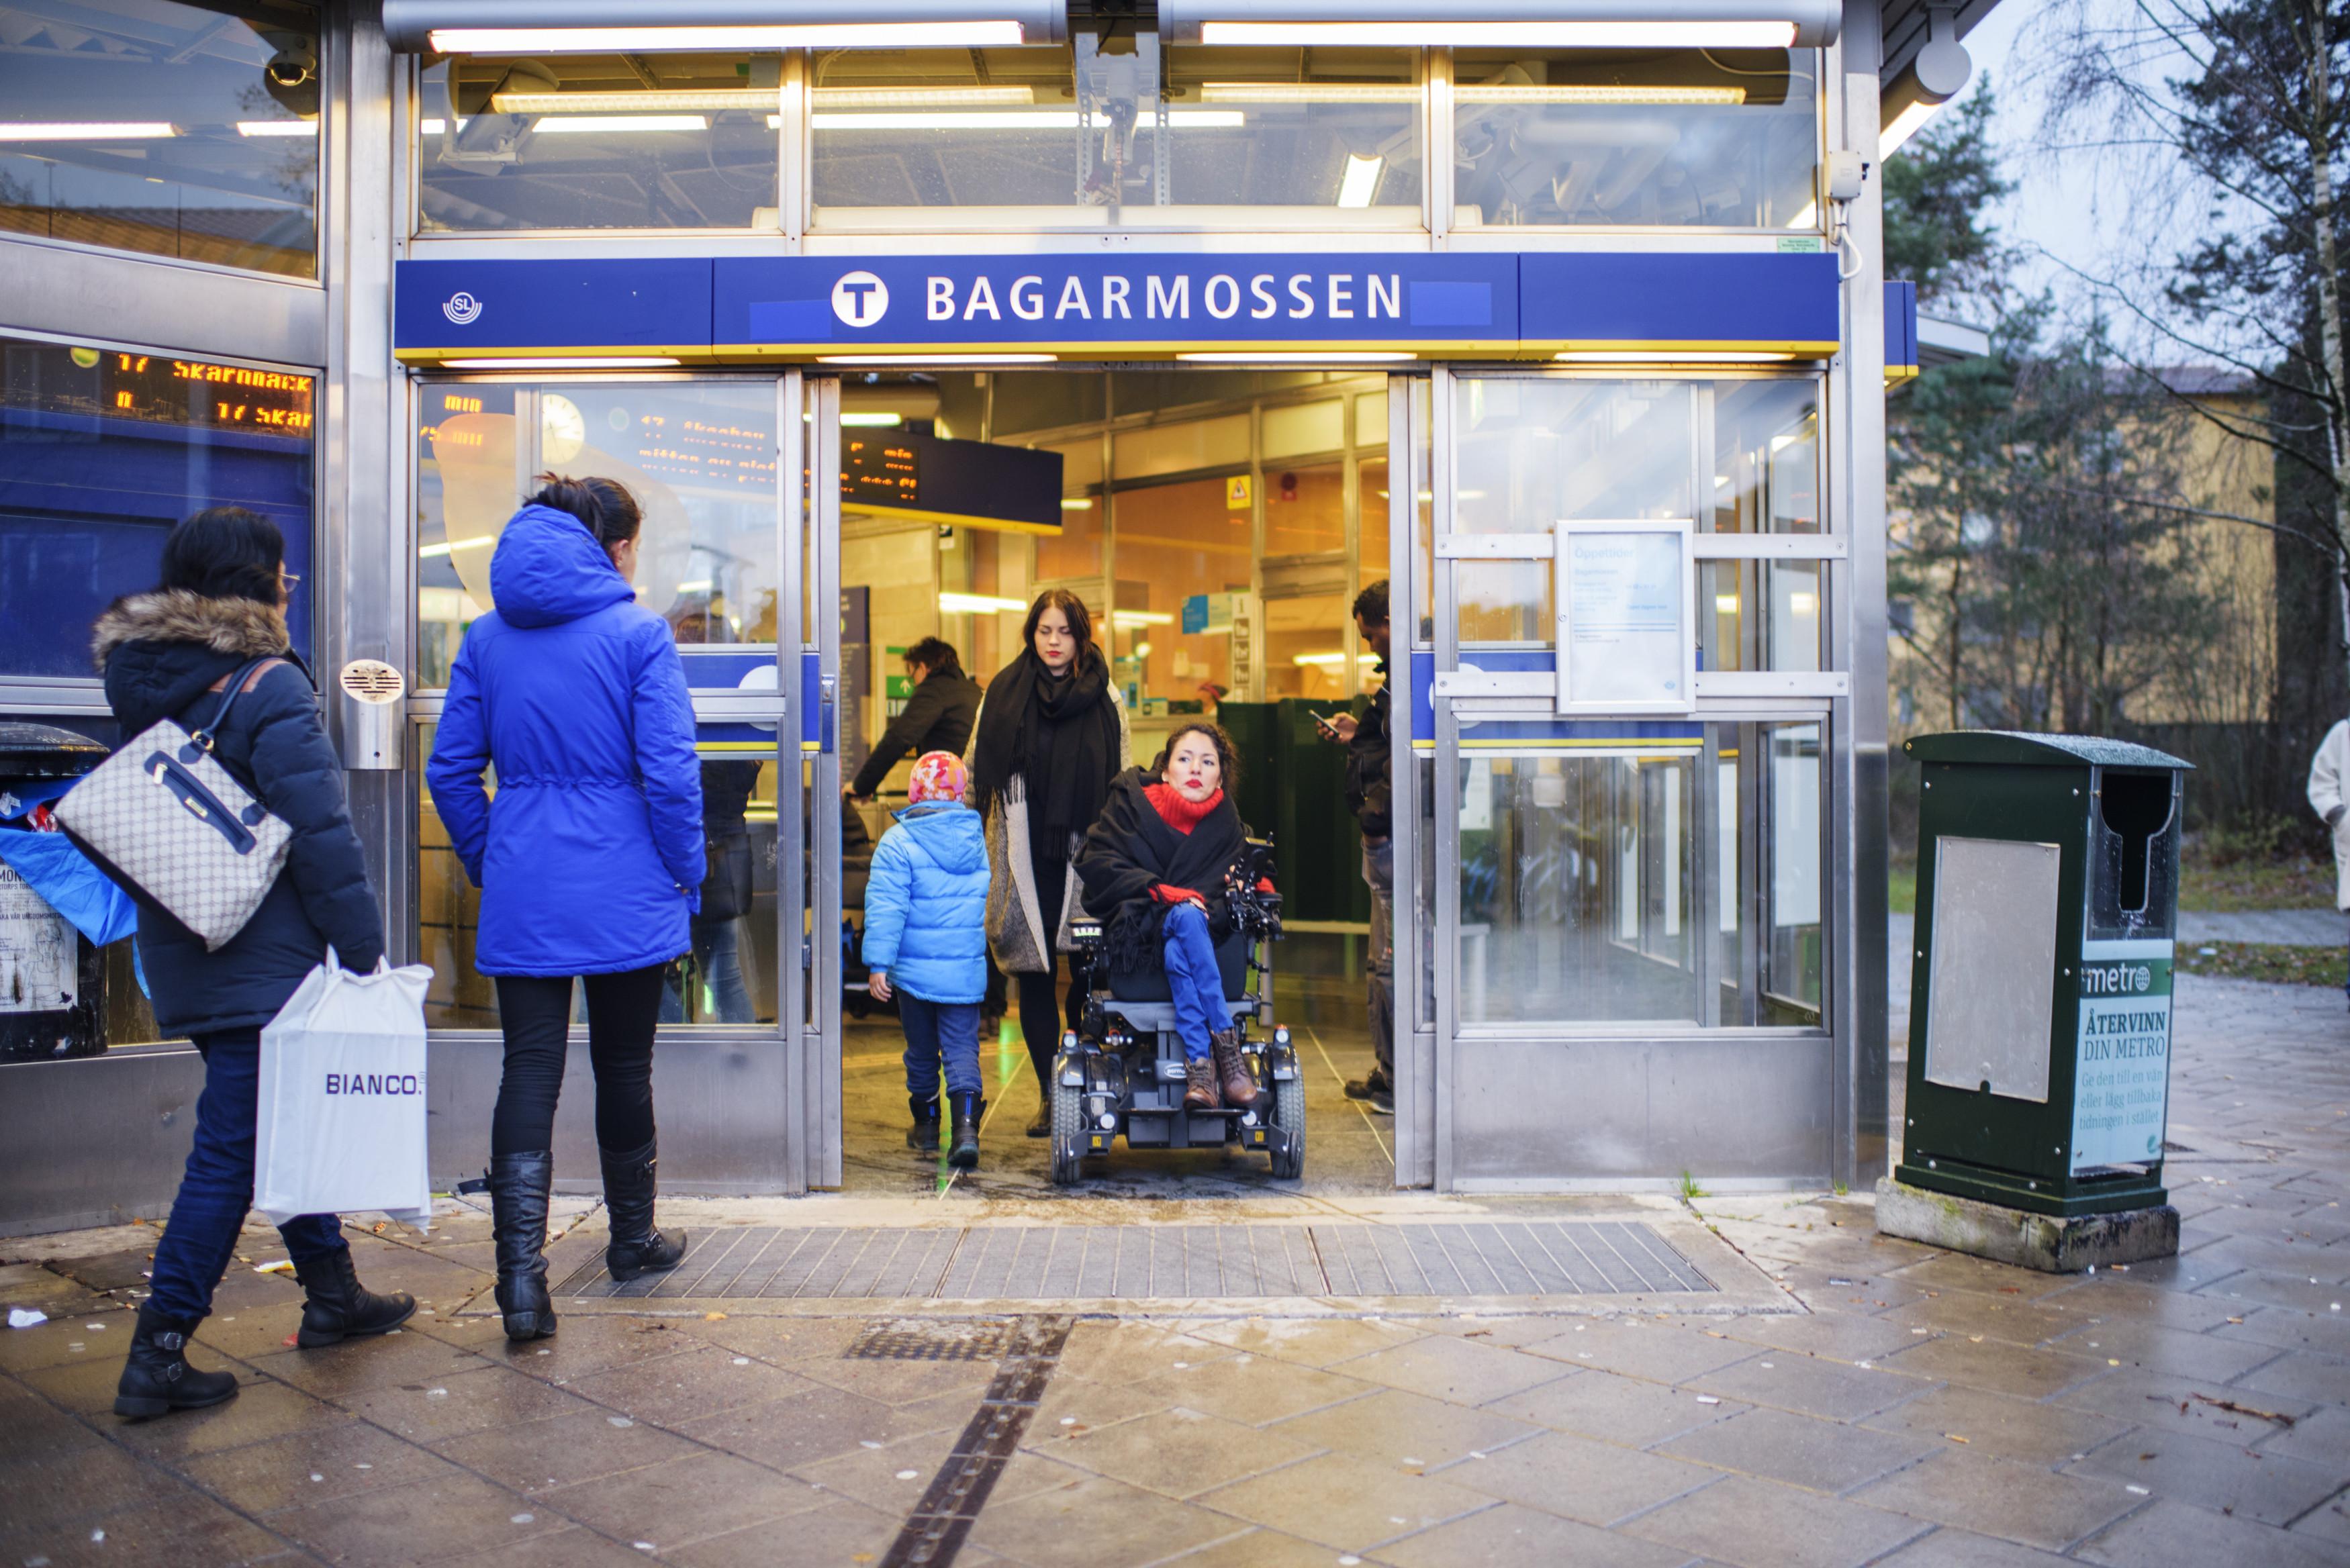 Métro Bagarmossen, Stockholm